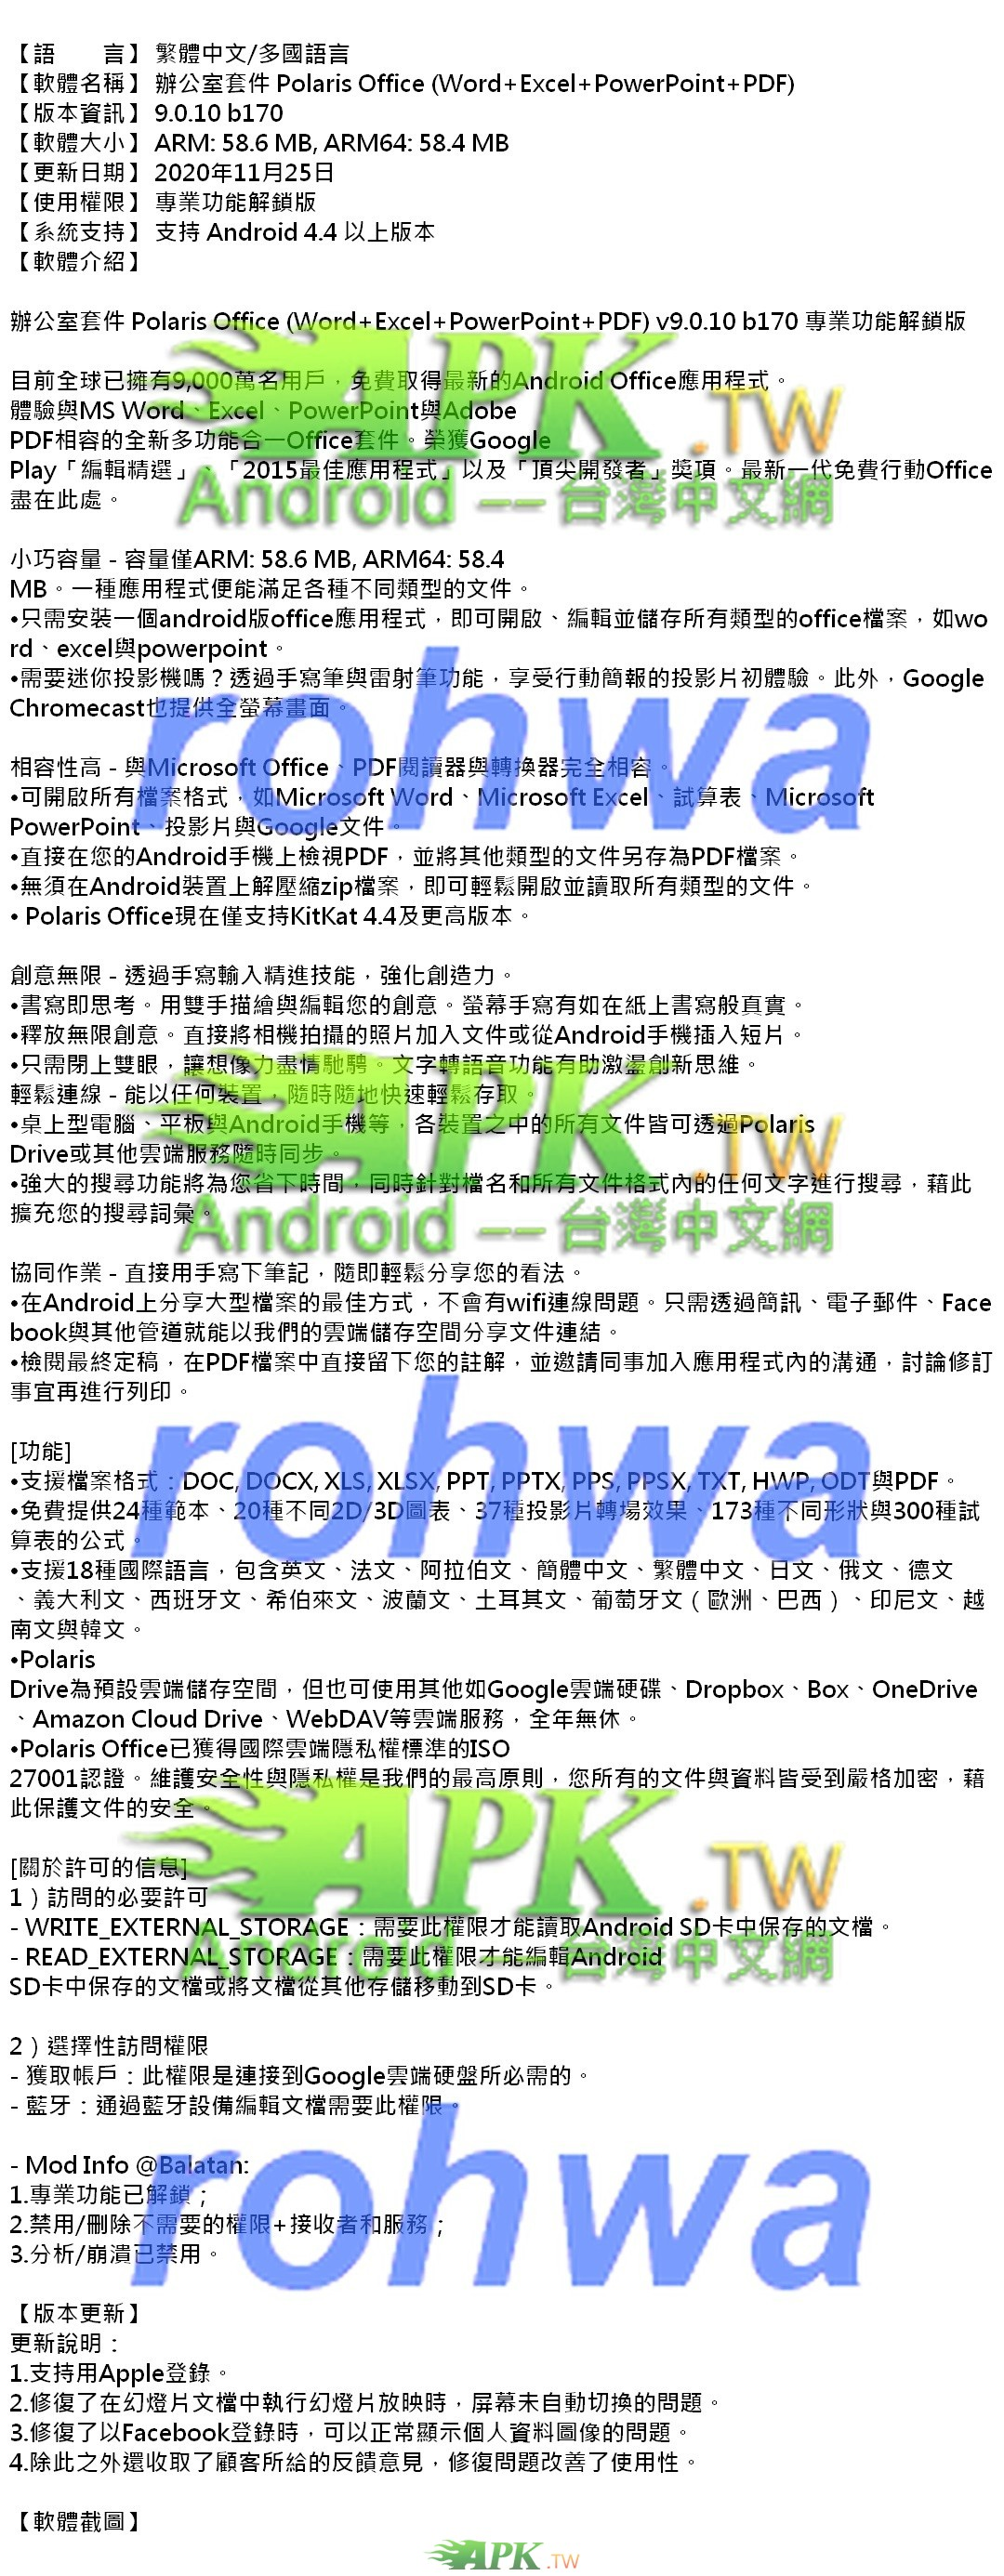 PolarisOffice_Pro_9.0.10_.jpg